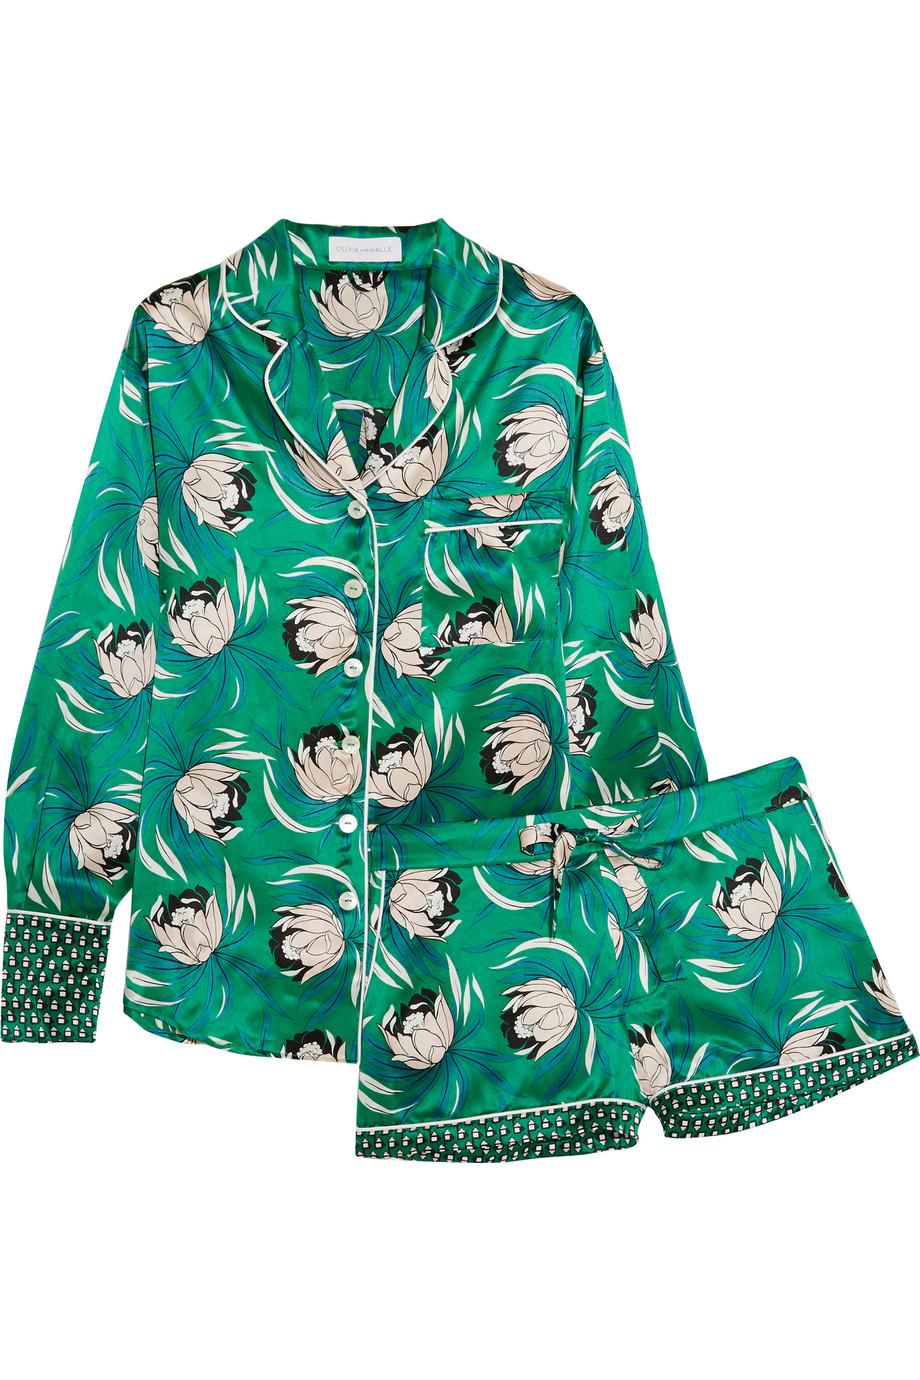 Alba Floral-Print Silk-Satin Pajama Set, Olivia Von Halle, Emerald, Women's, Size: 1